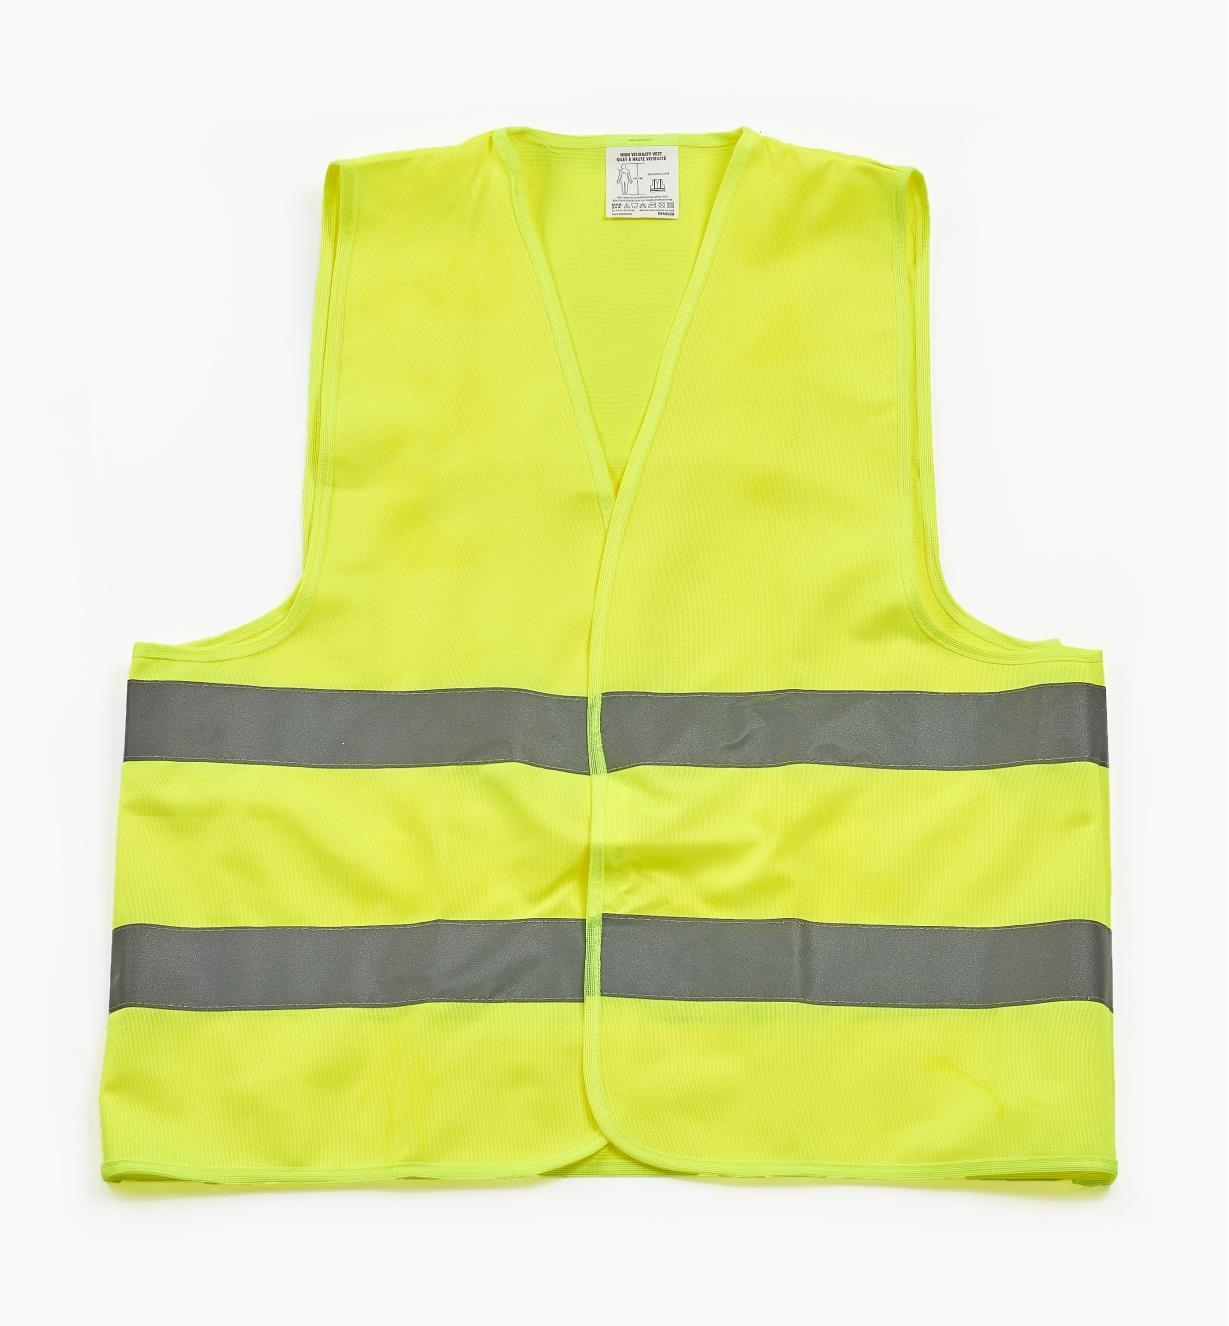 09A0926 - High-Visibility Vest, Large